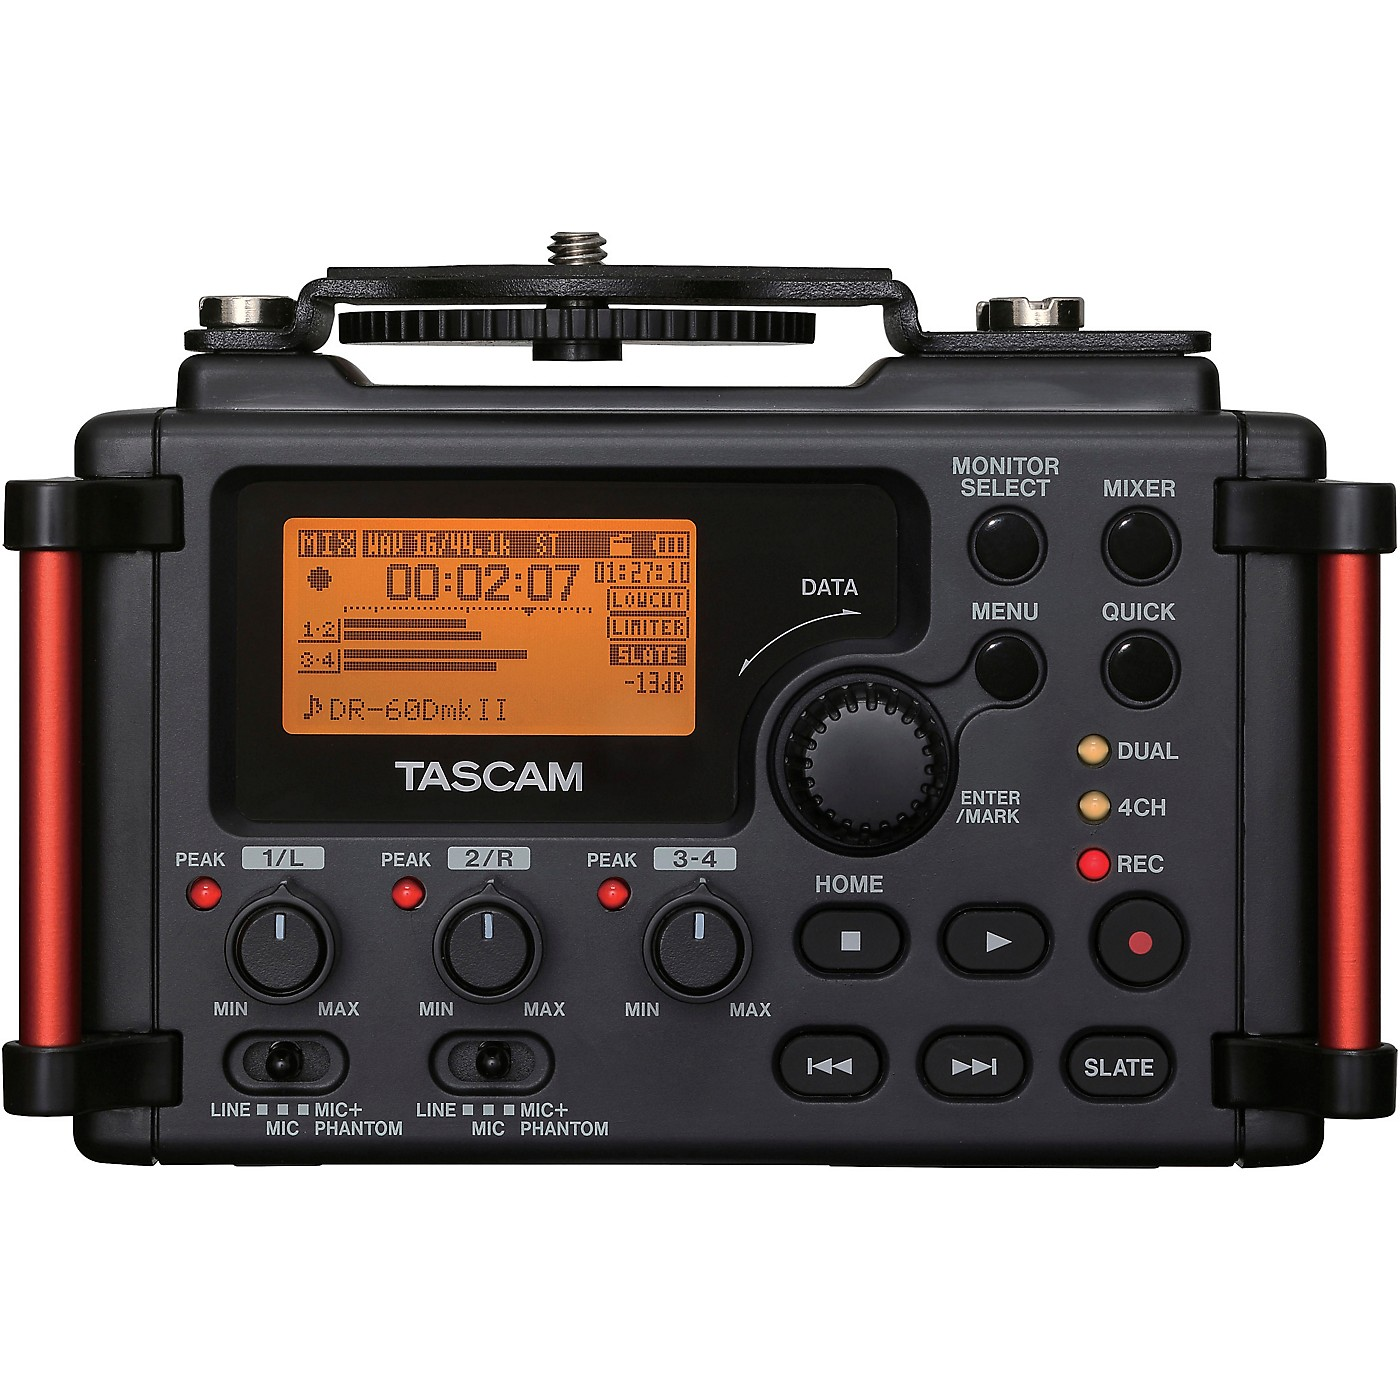 TASCAM DR-60DmkII 4-Channel Portable Recorder for DSLR thumbnail